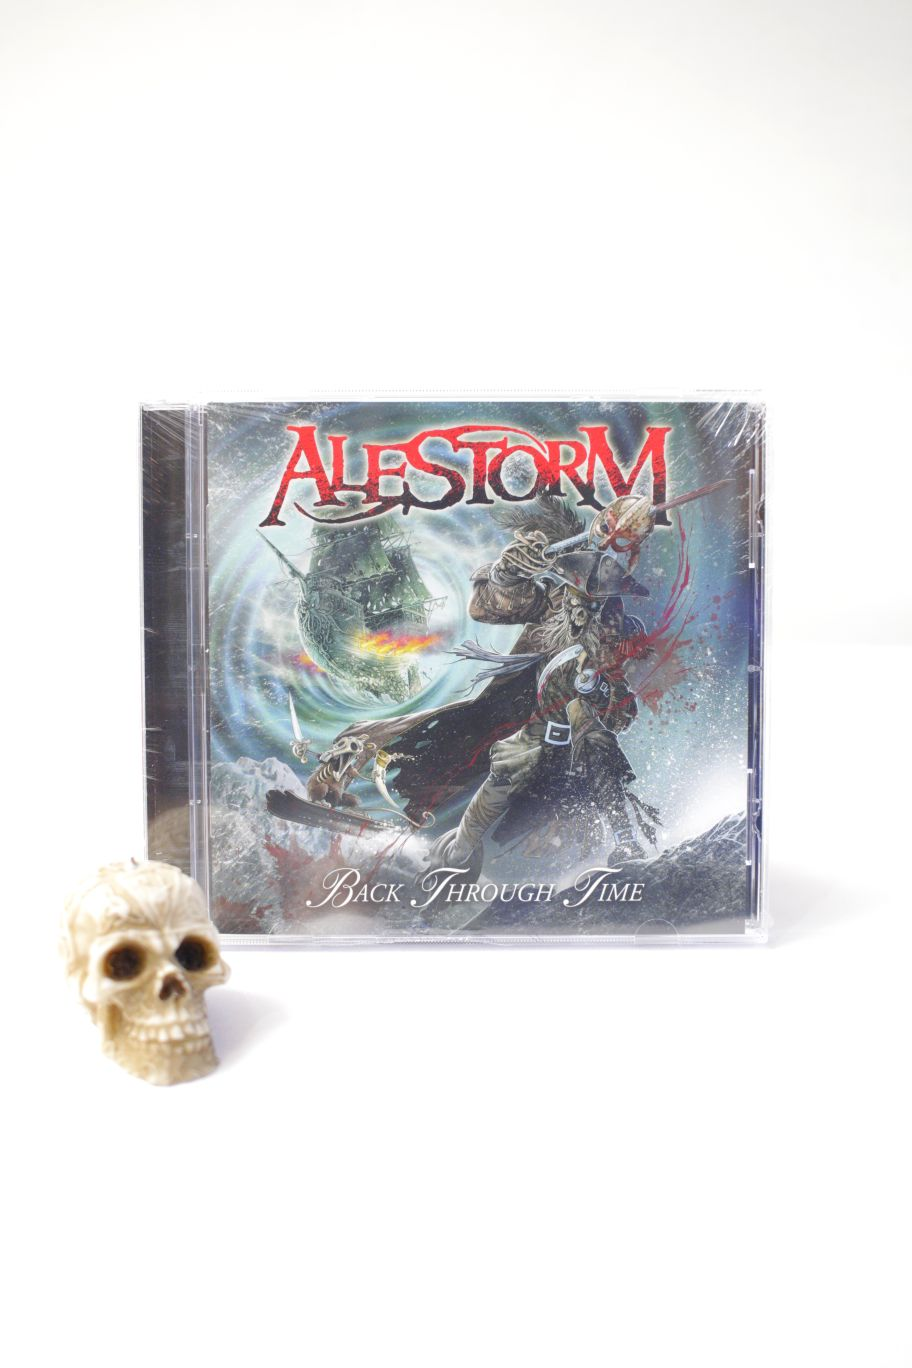 CD ALESTORM BACK THROUGH TIME